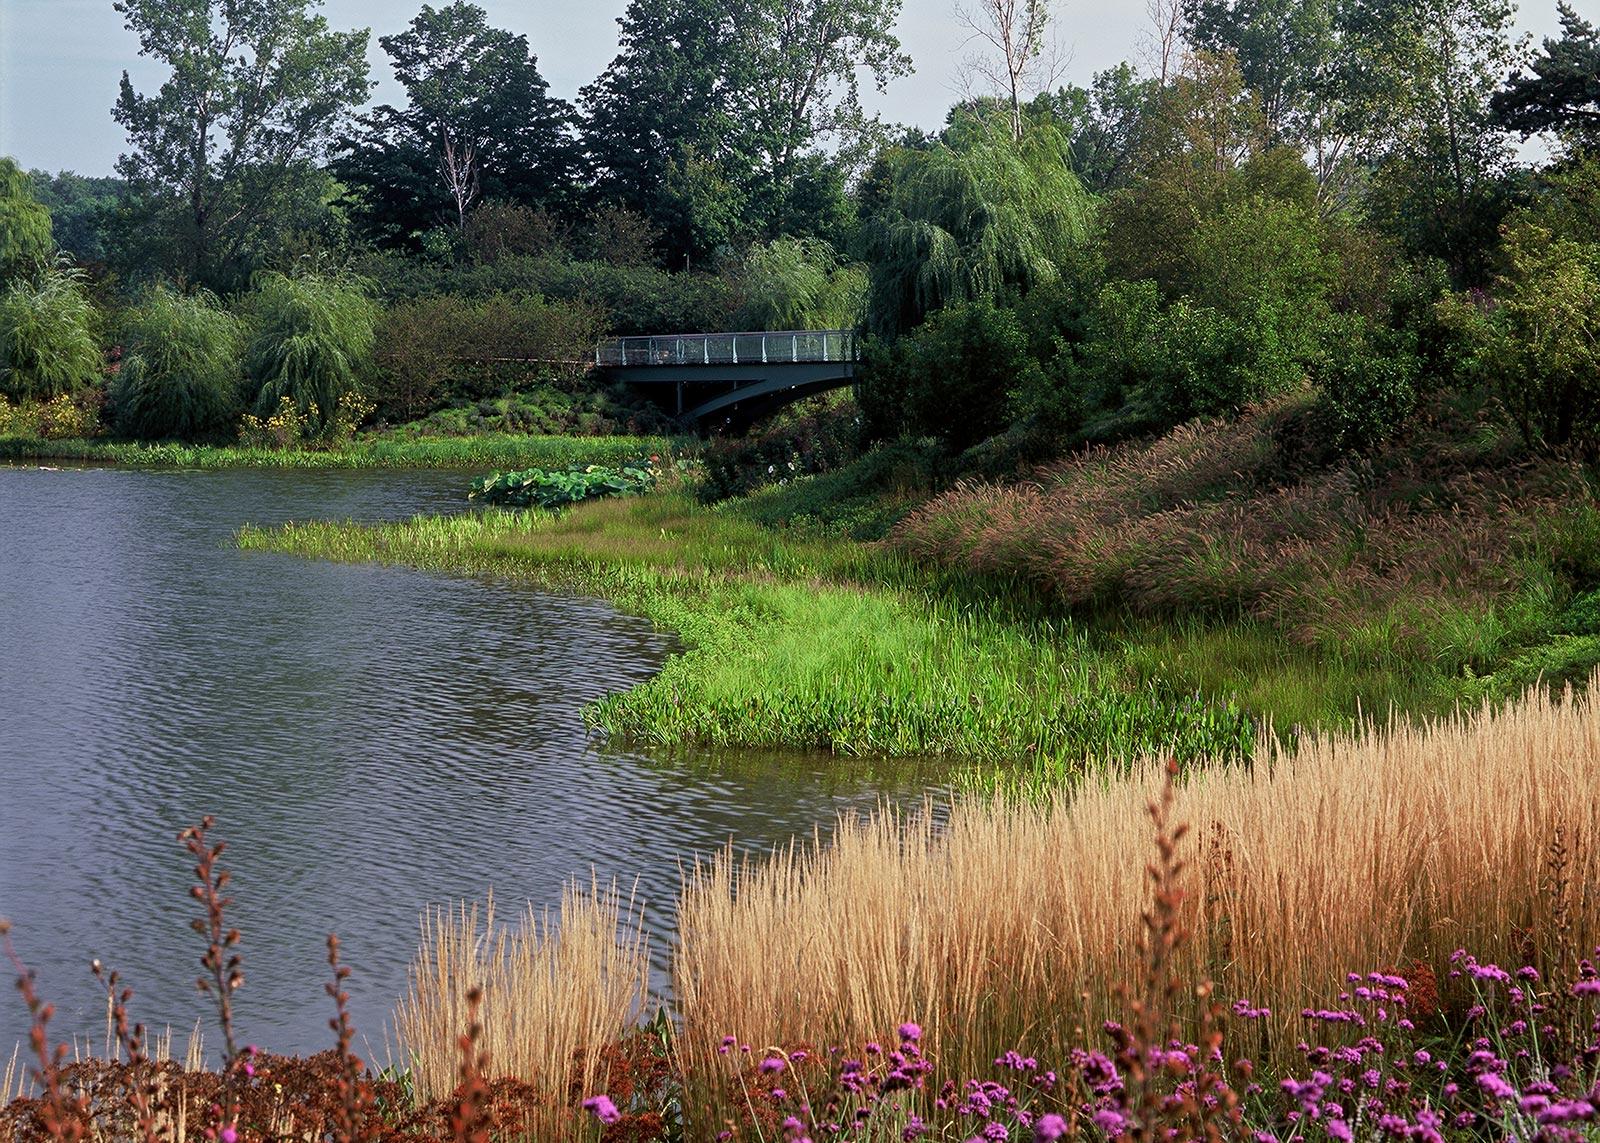 Gardens-of-Great-Basin-2-Gallery1